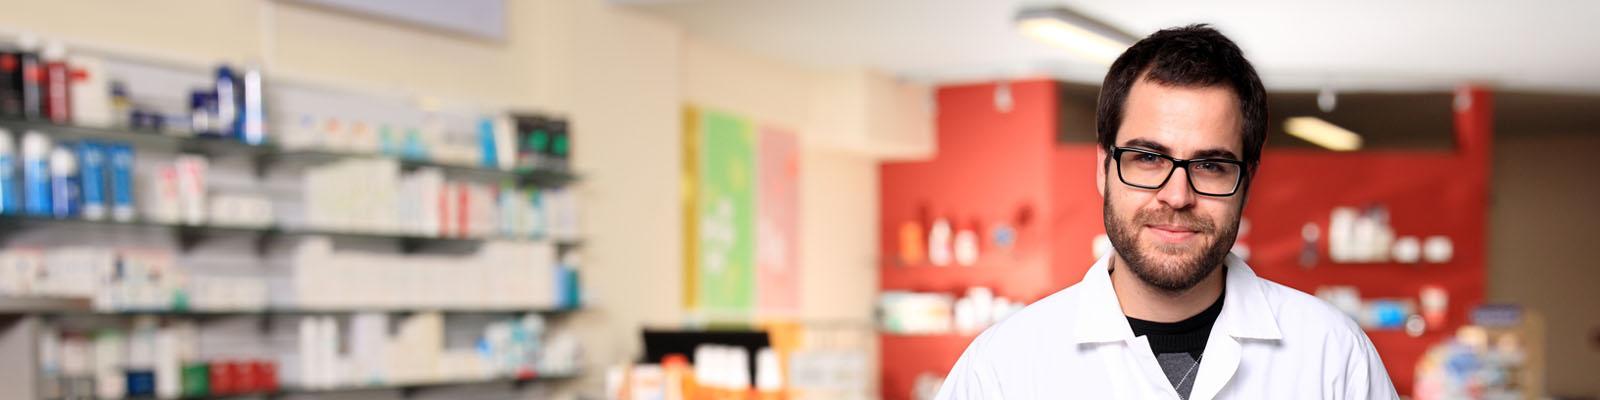 Pharmacies in San Antonio Texas